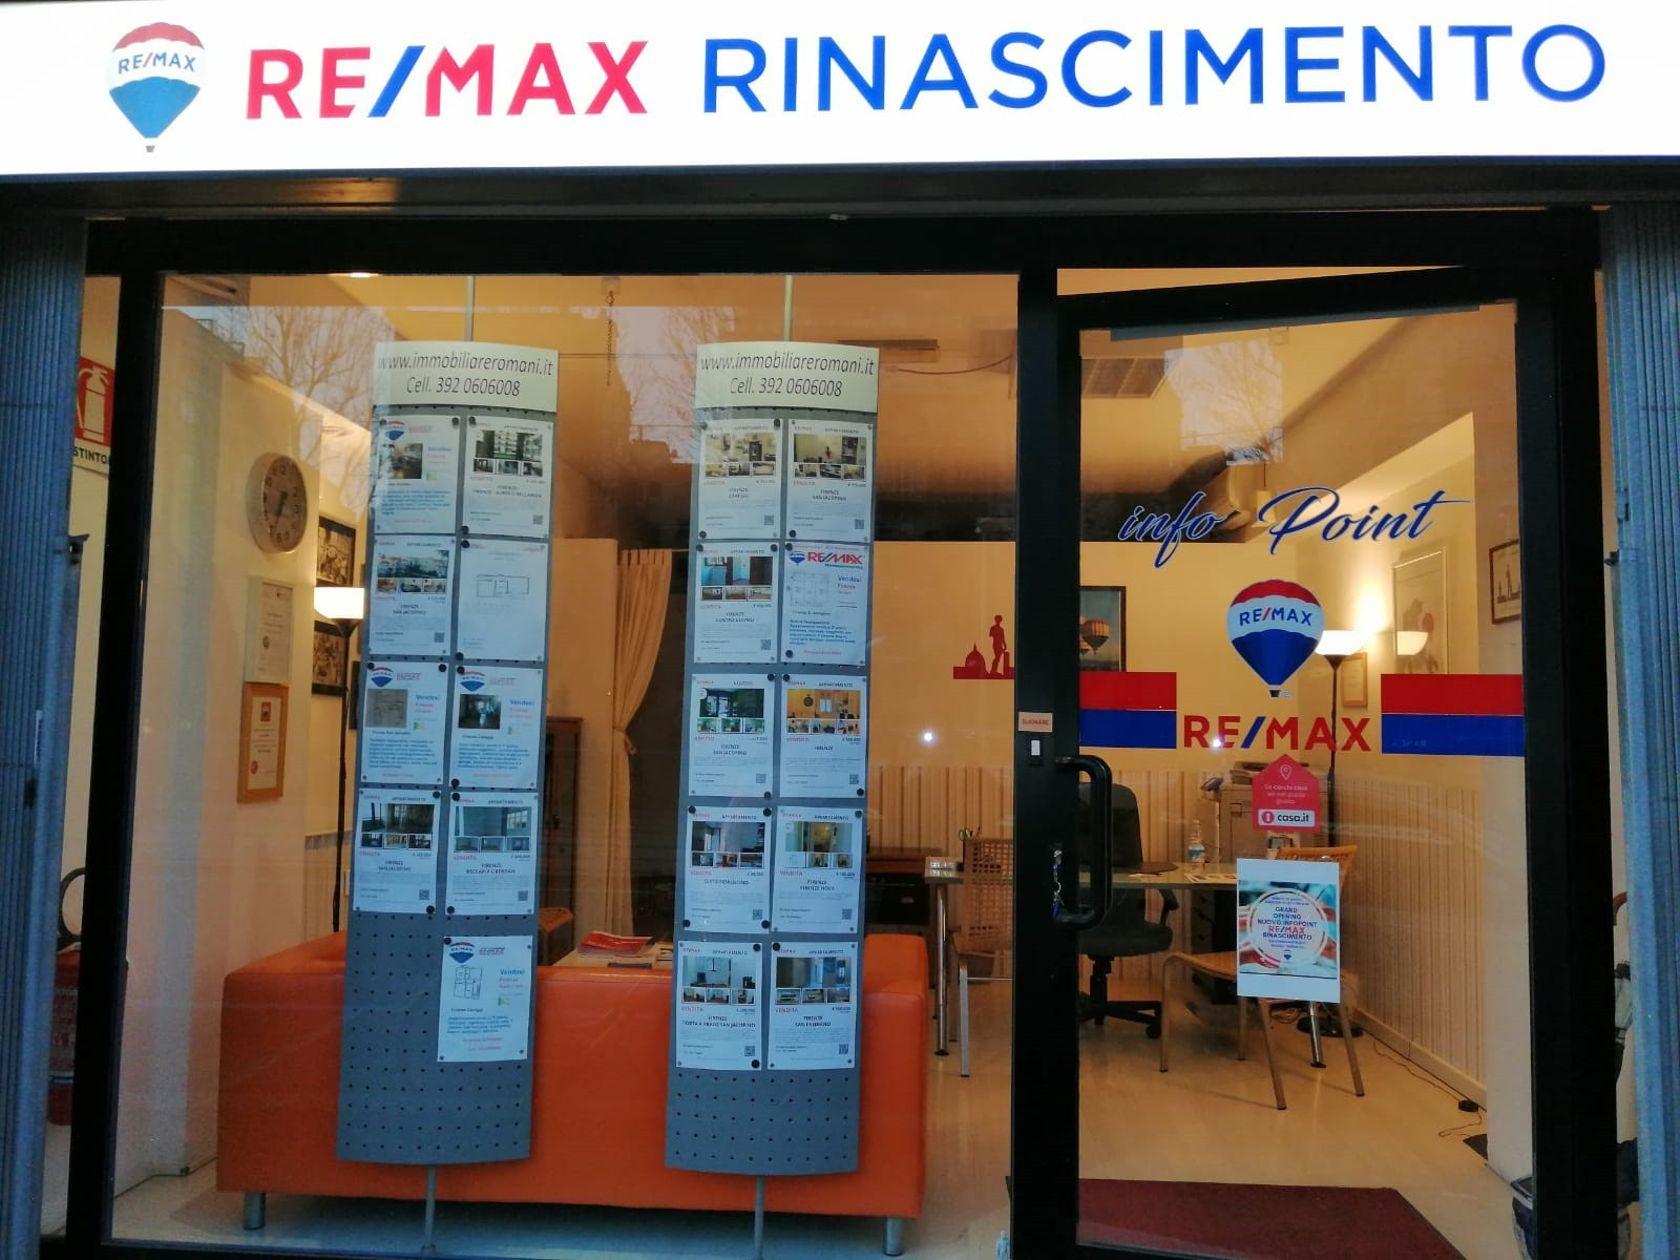 RE/MAX Rinascimento 3 Firenze